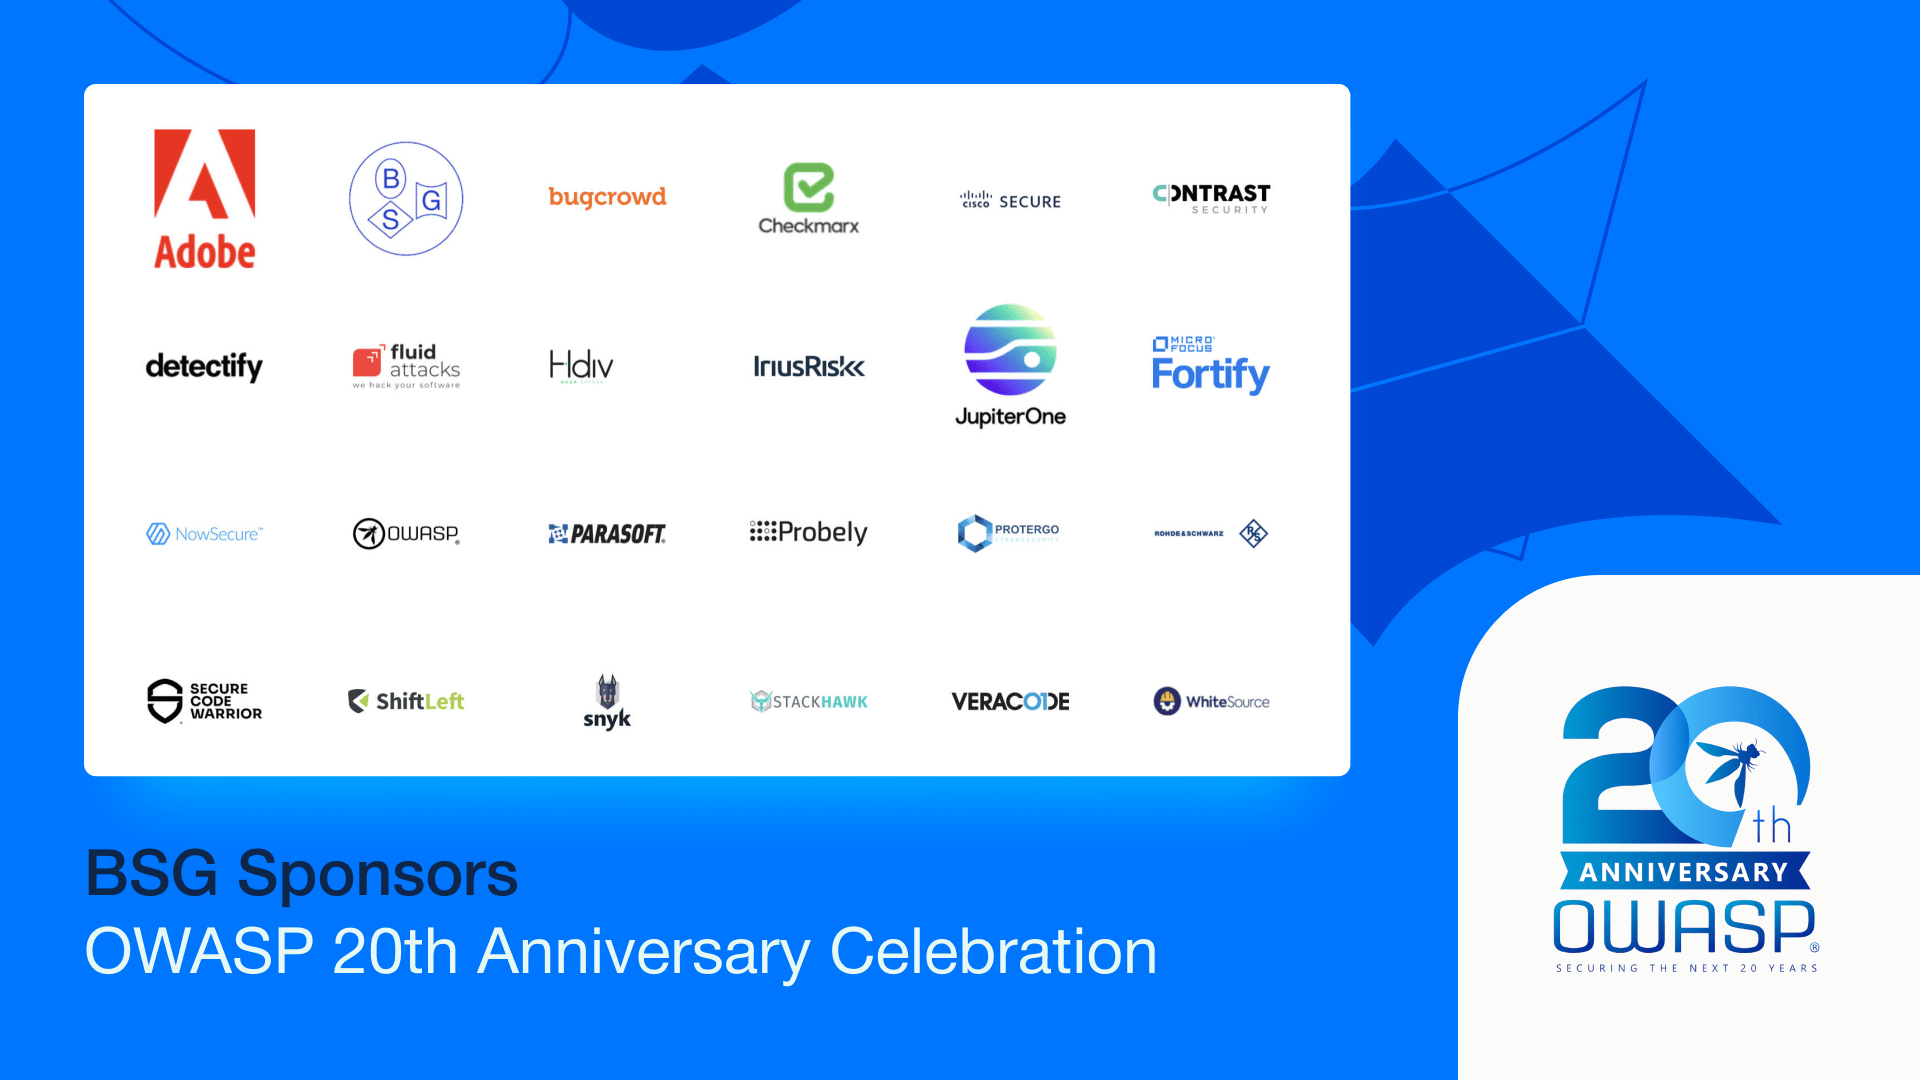 OWASP 20th Anniversary Celebration Sponsors - Berezha Security Group